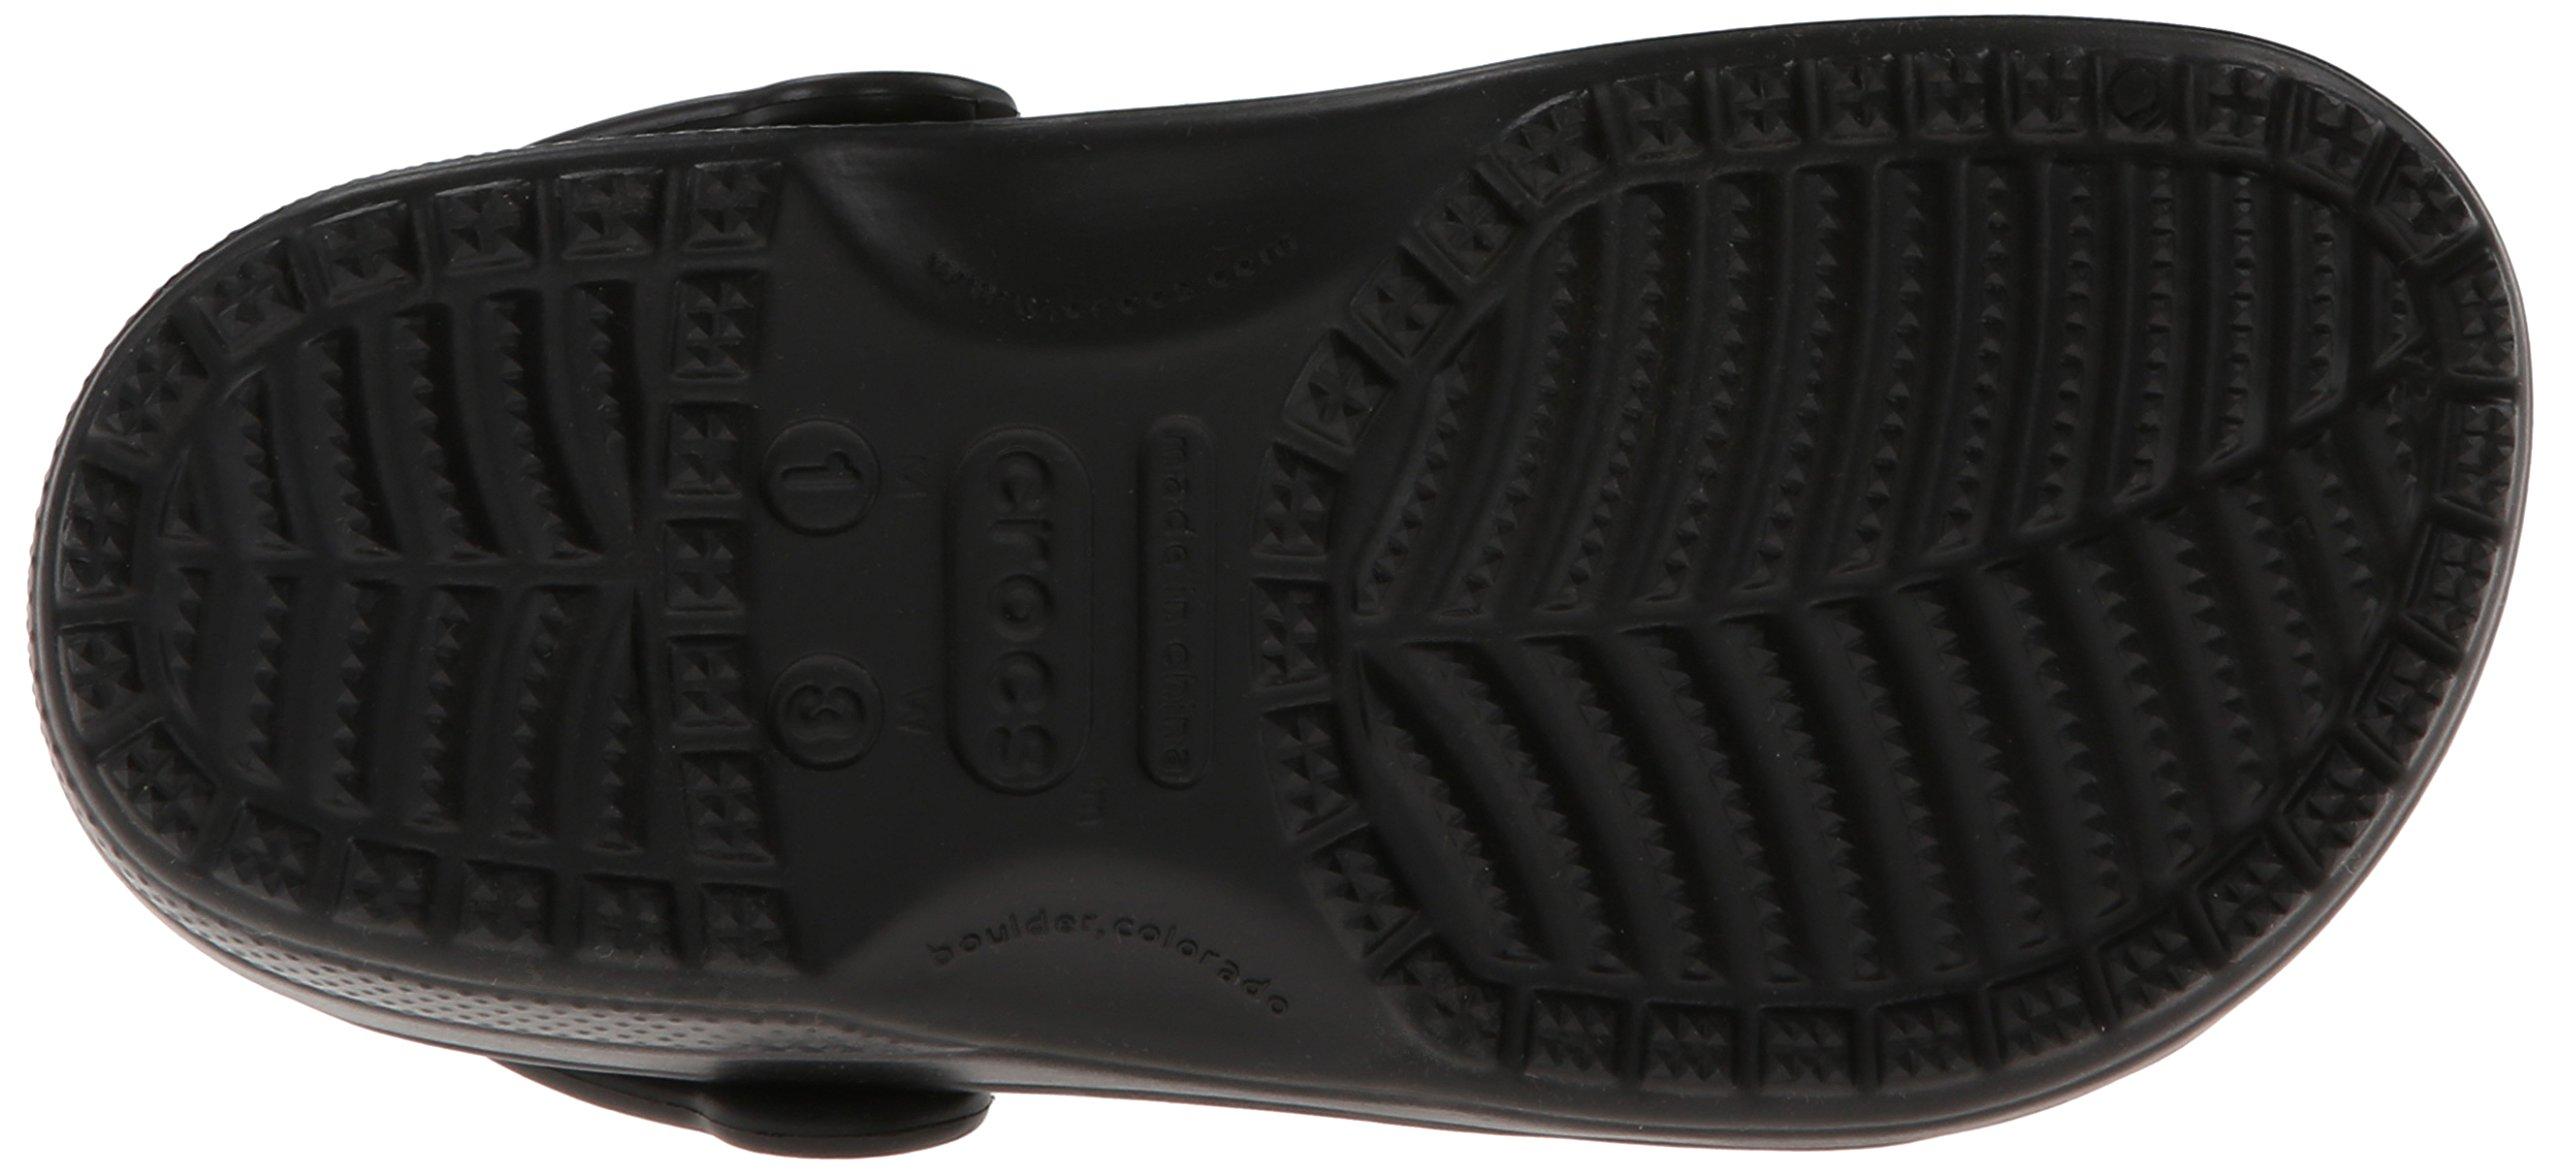 Crocs Kids 15394 I Love NY Classic Clog (Toddler/Little Kid),Black,6 M US Toddler by Crocs (Image #3)